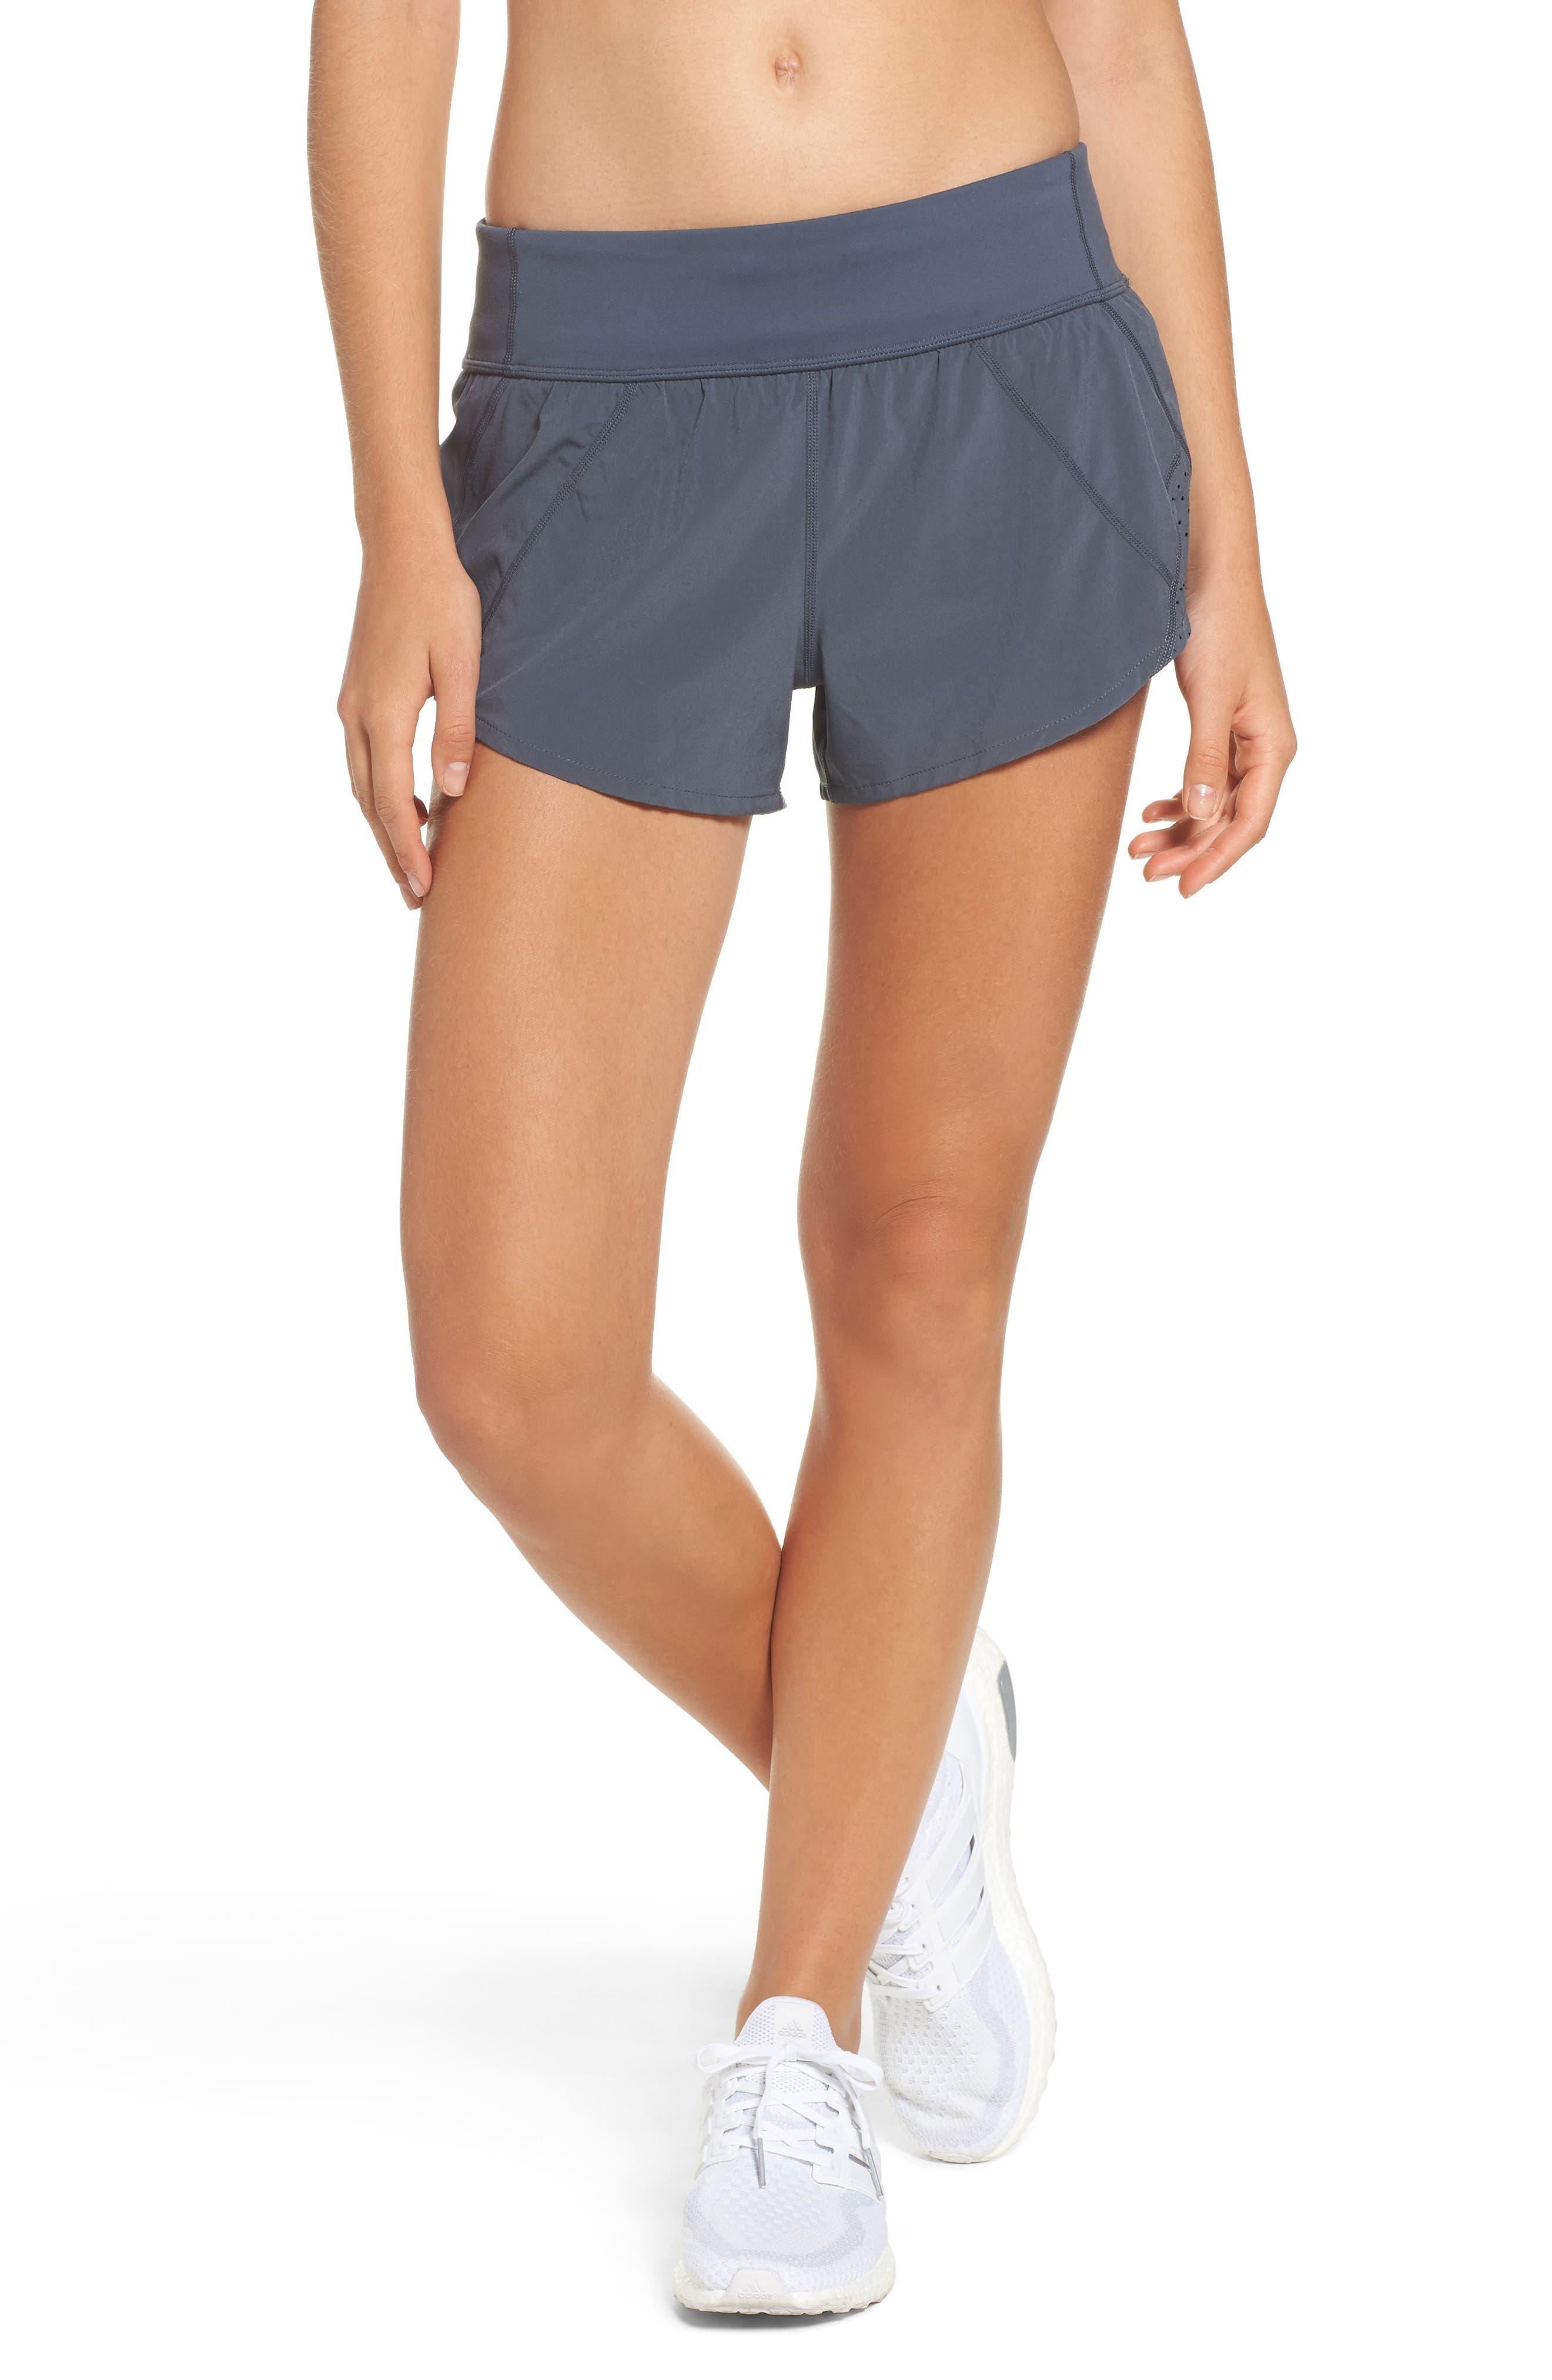 Runaround Compact Shorts,                         Main,                         color, Grey Graphite